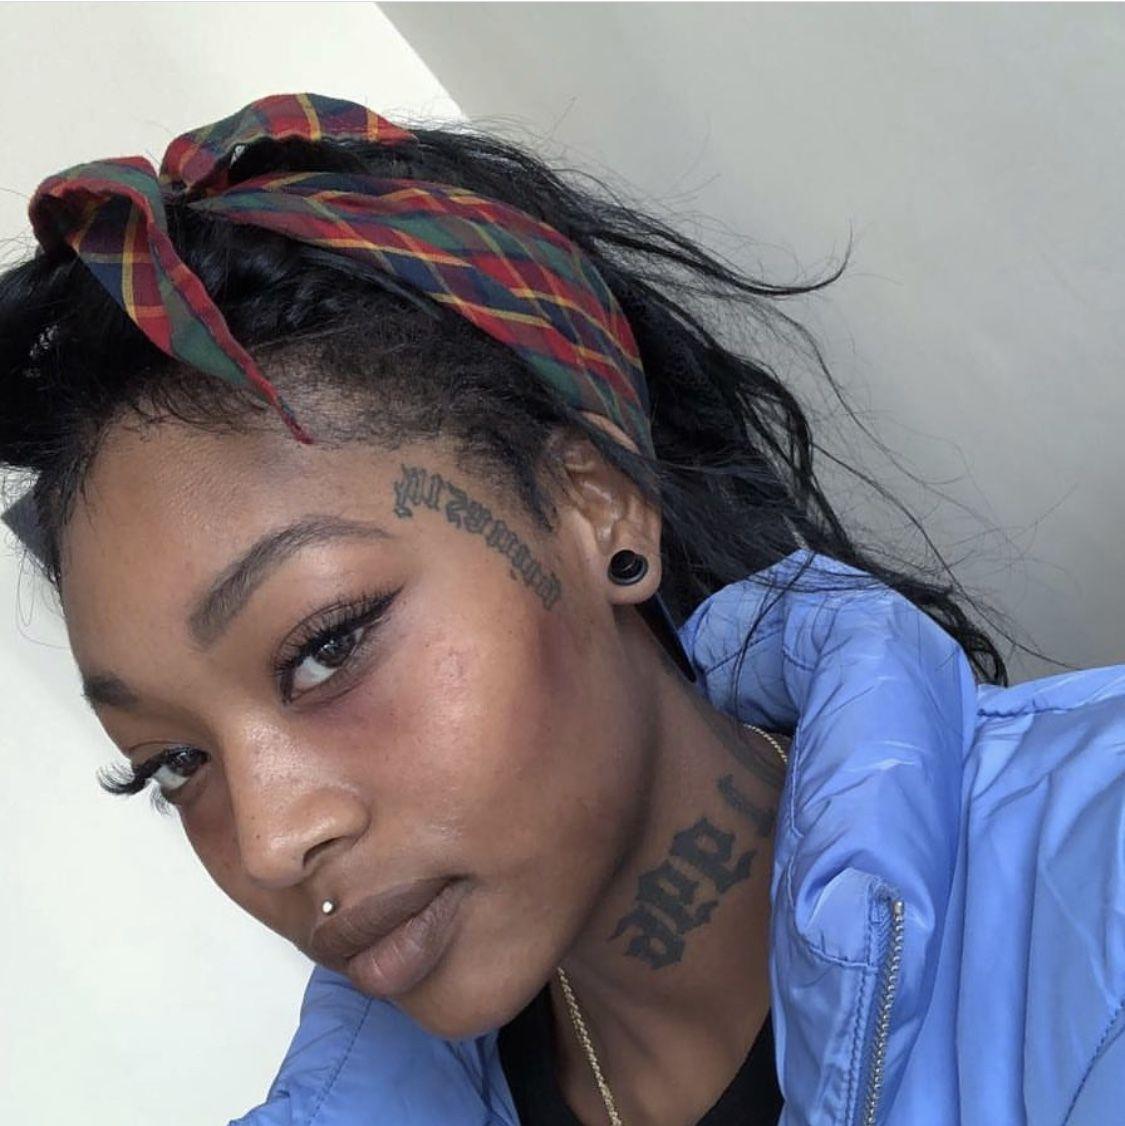 summerwalker Face tattoos for women, Black girls with